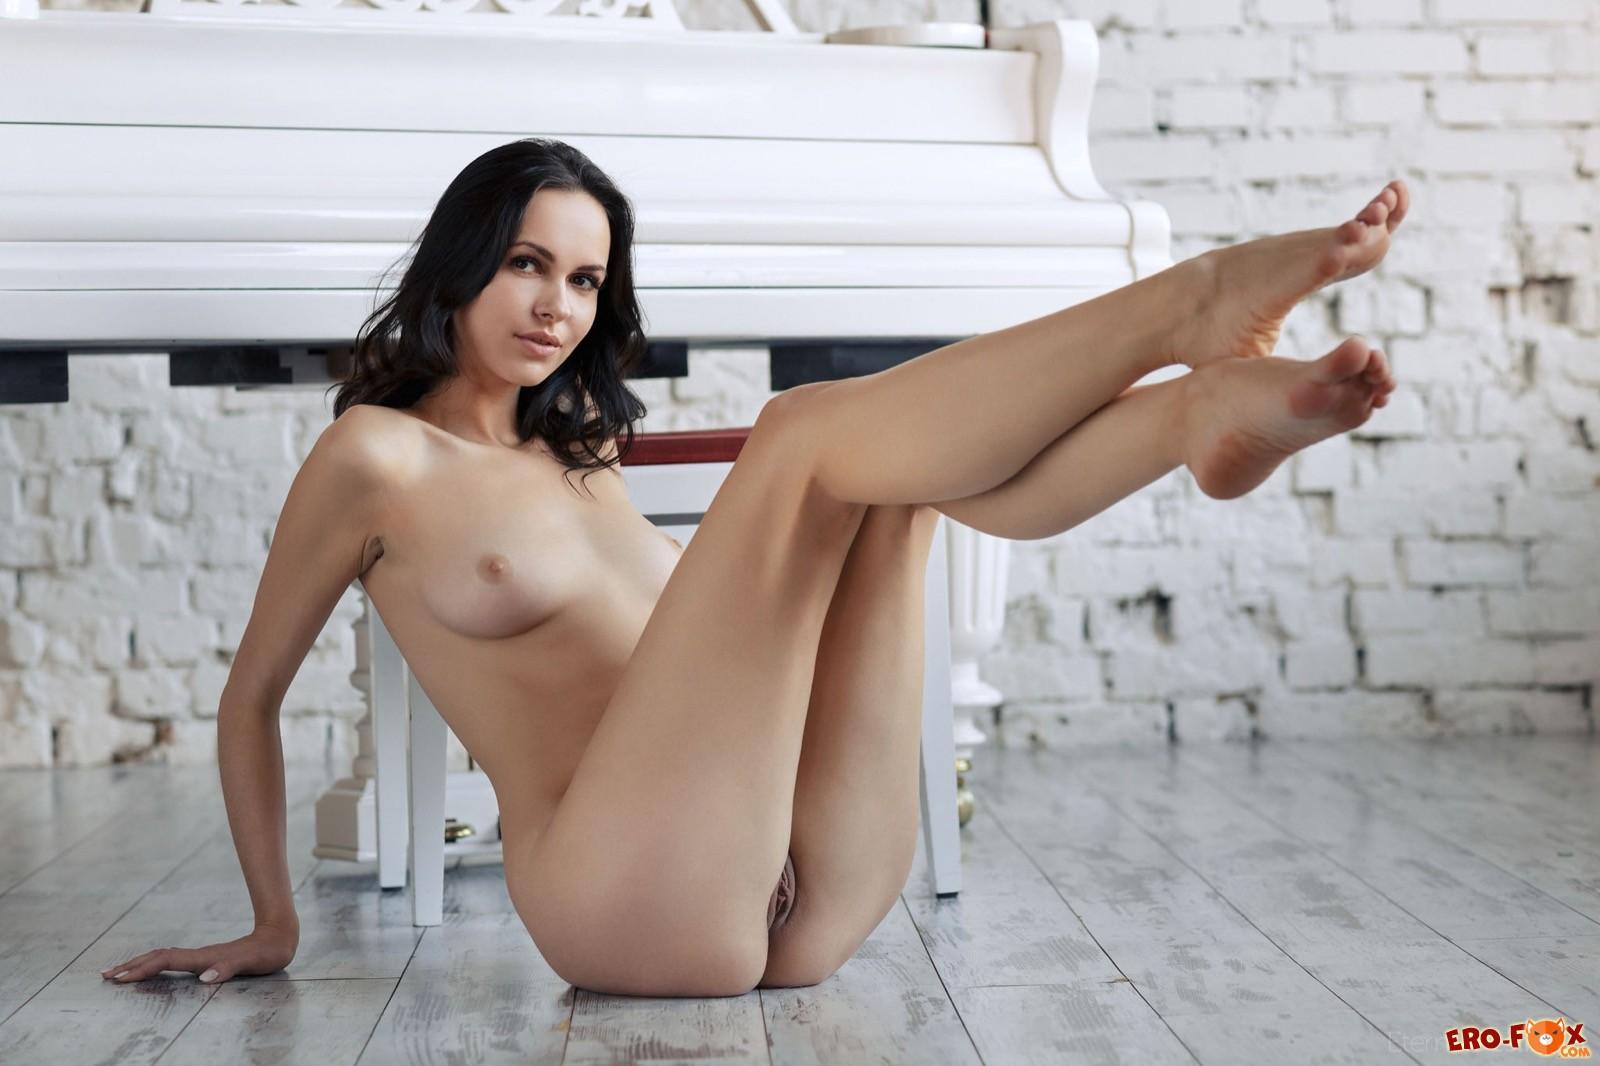 Красивая голая брюнетка у рояля